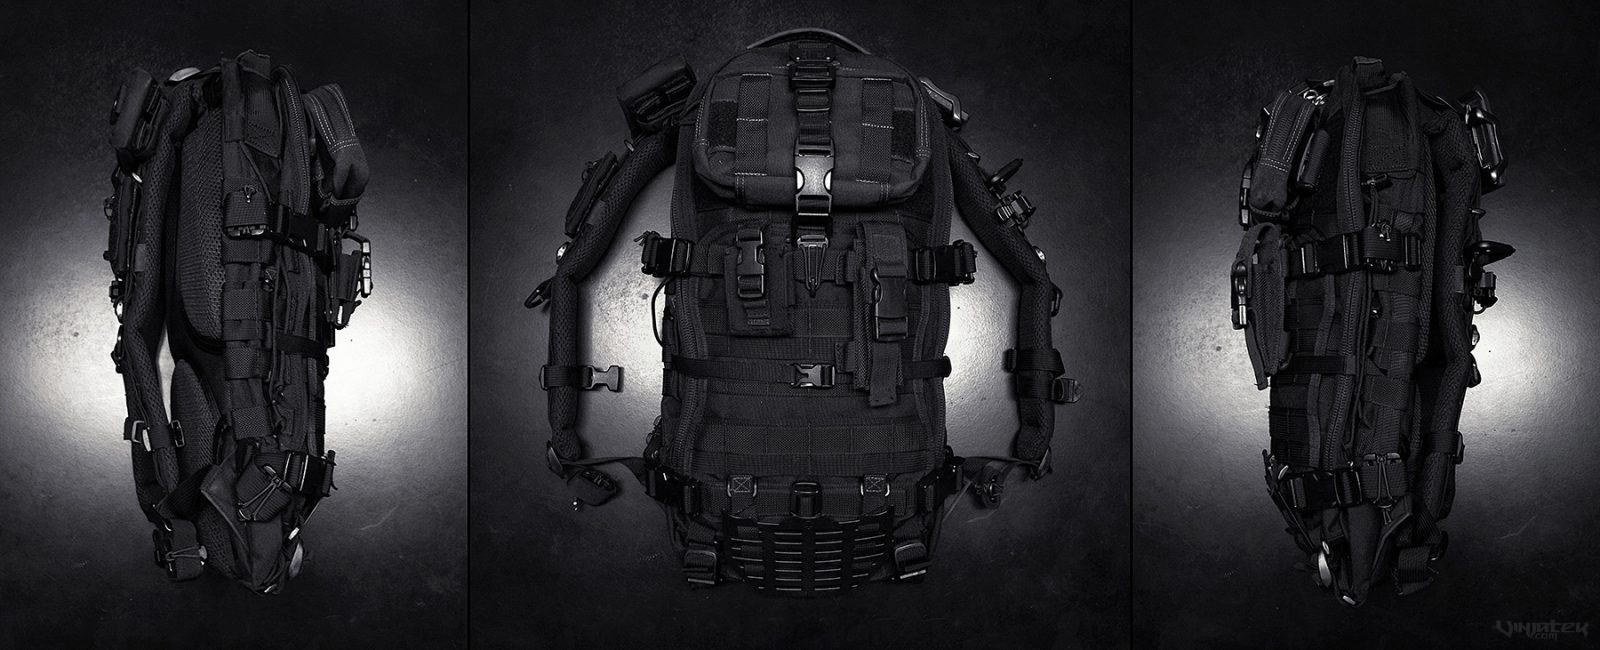 Triple Aught Design FAST Pack Litespeed Reengineered /// Vinjatek